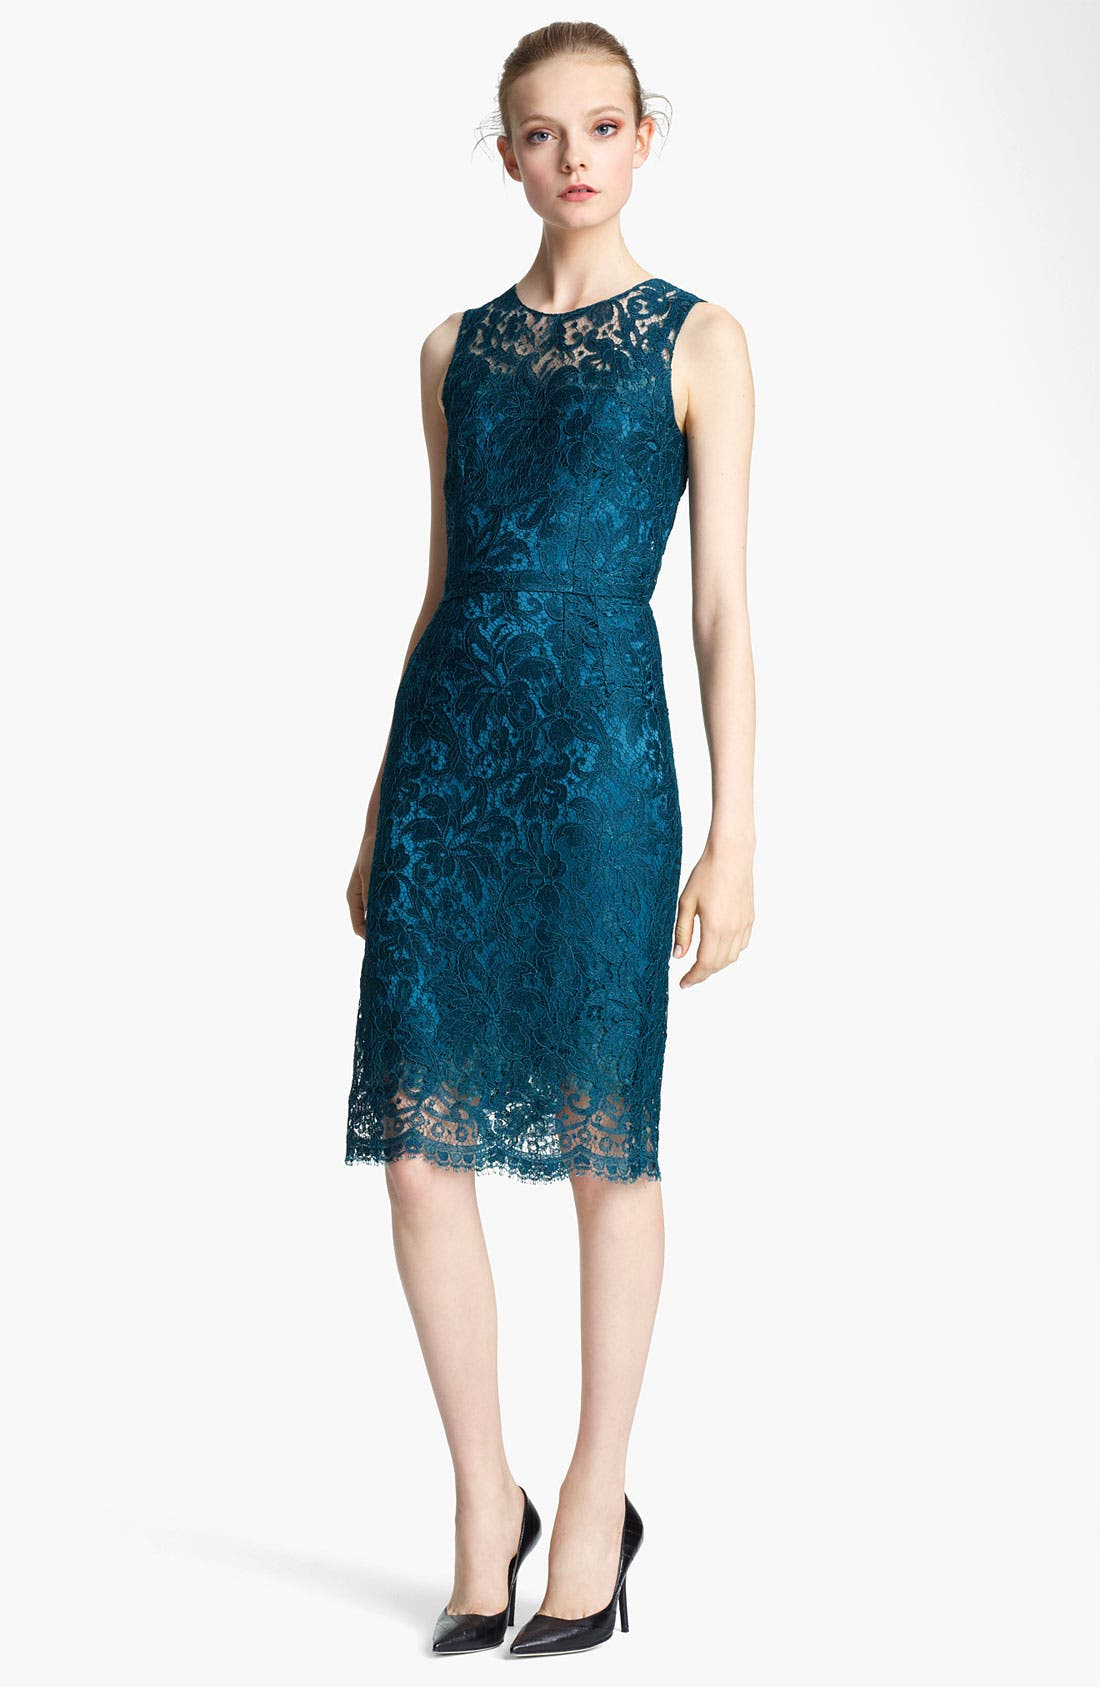 Alternate Image 1 Selected - Dolce&Gabbana Lace Pencil Dress